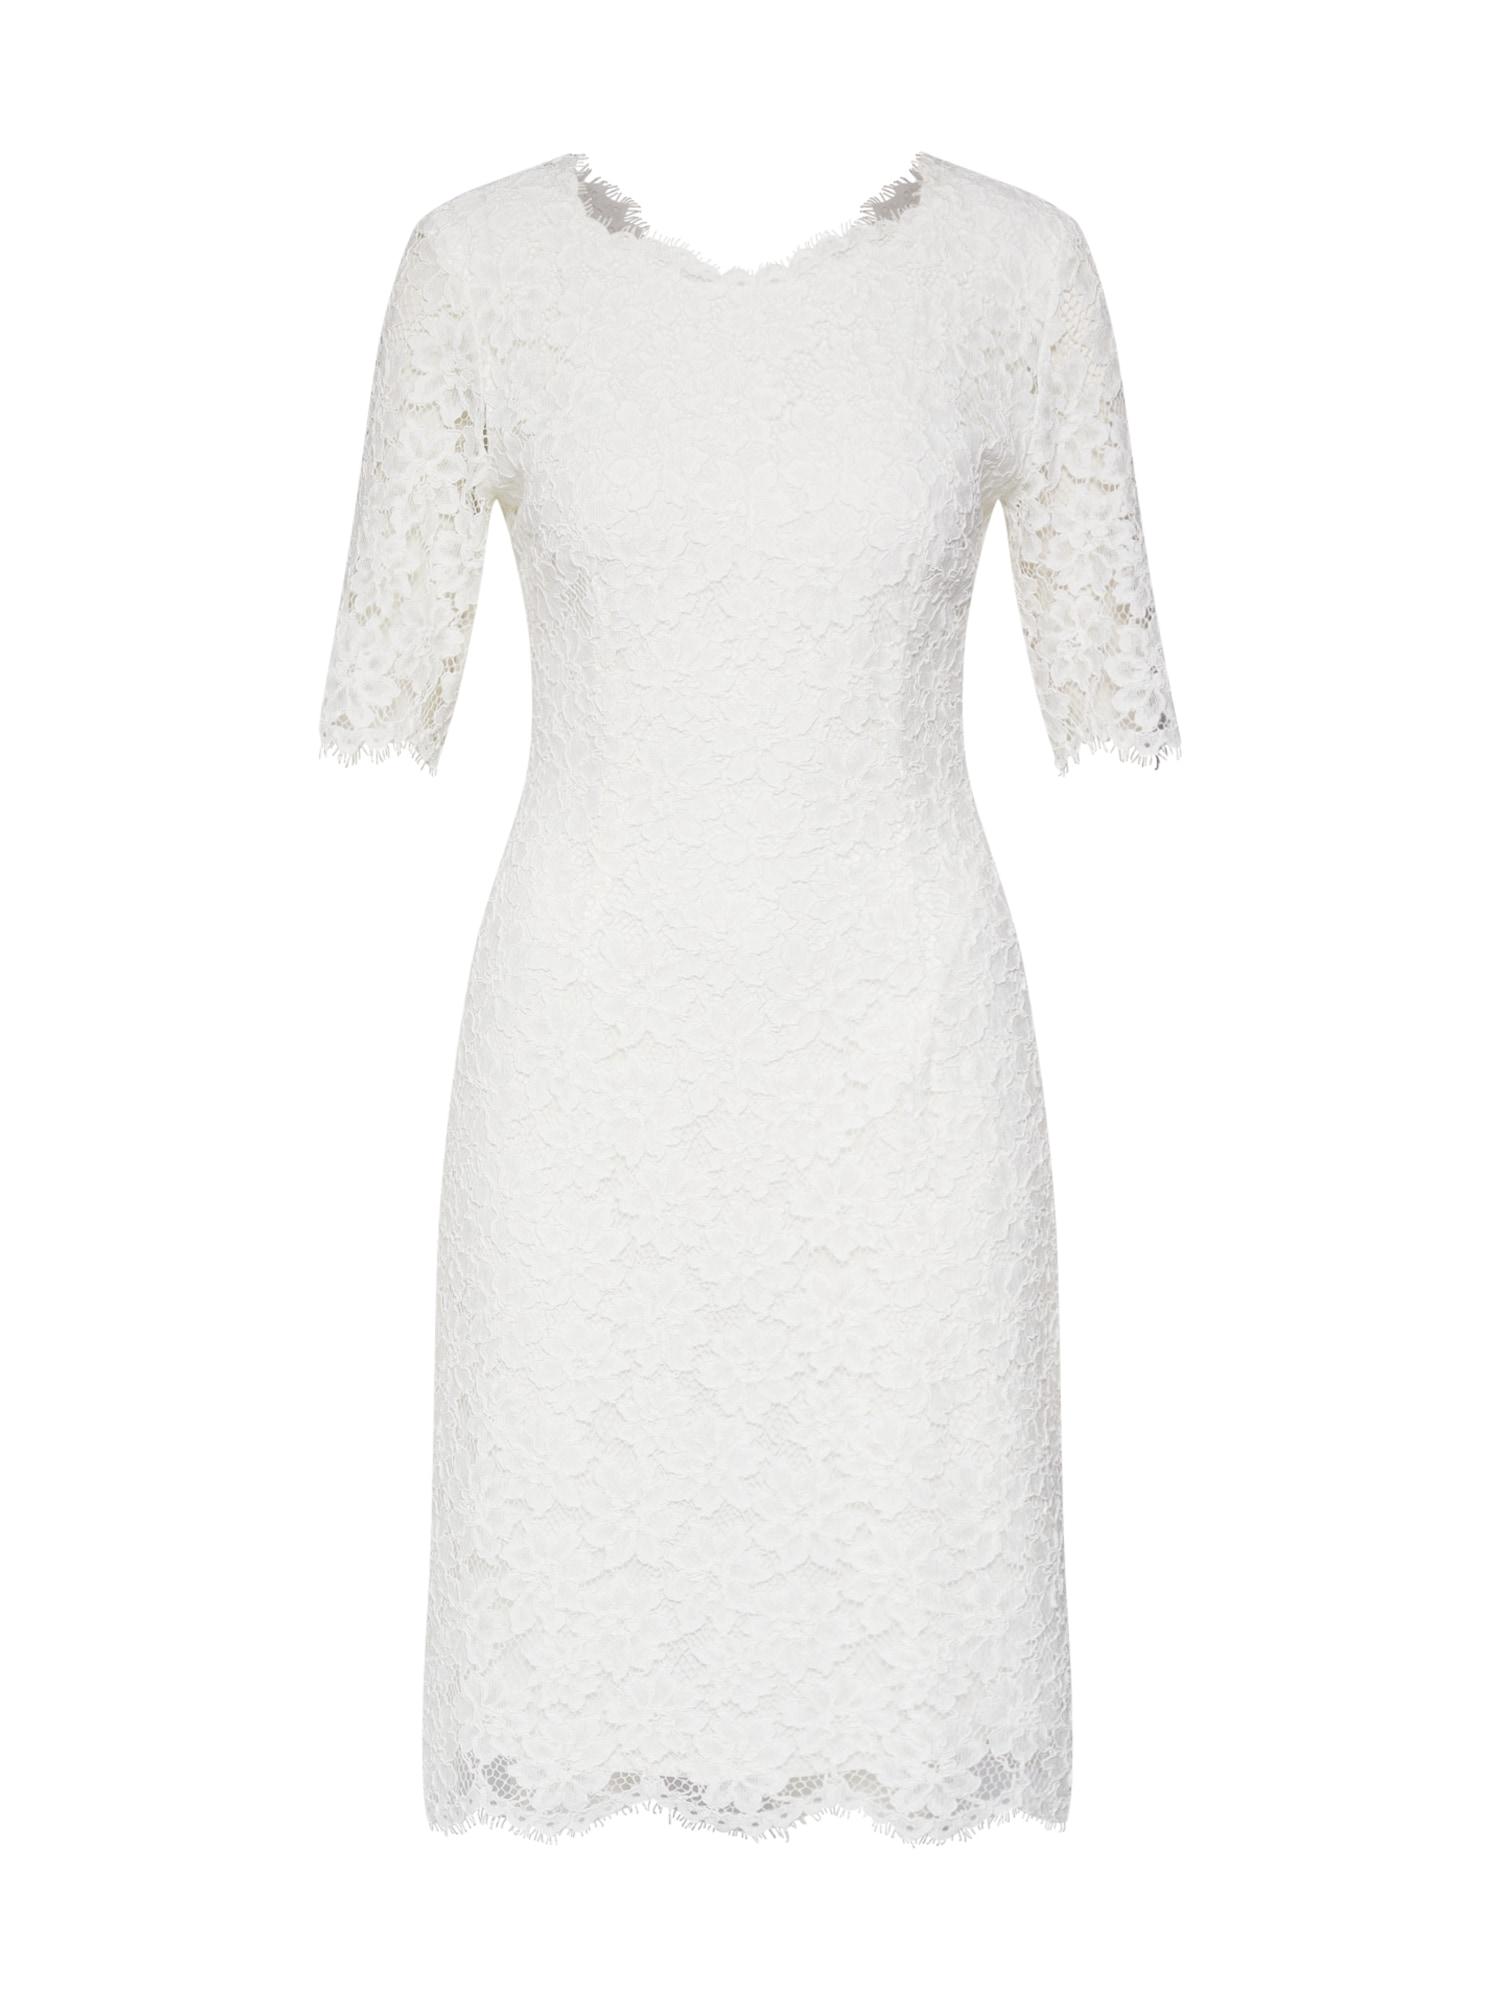 Šaty Kalissy-1 bílá HUGO